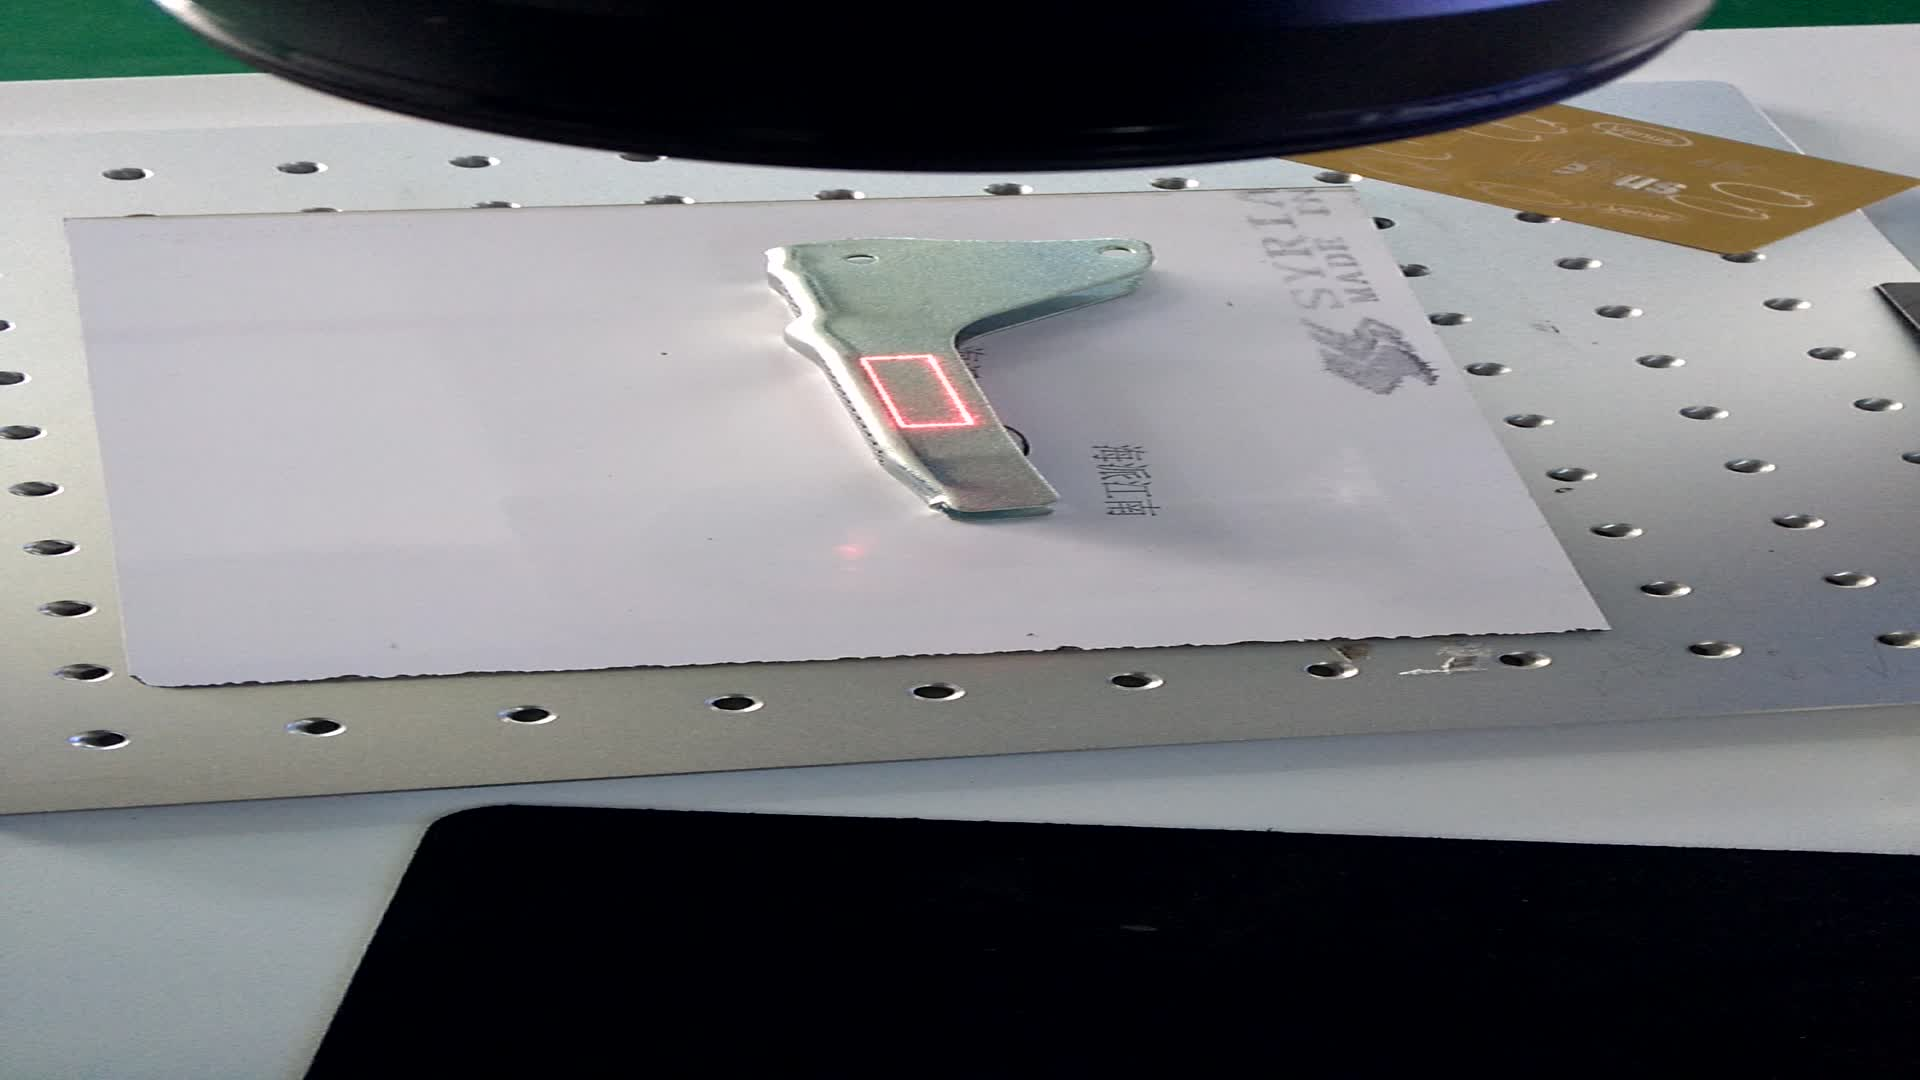 20 w Toetsenbord muis scherm shell computer onderdelen goedkope laser graveermachine markering machine